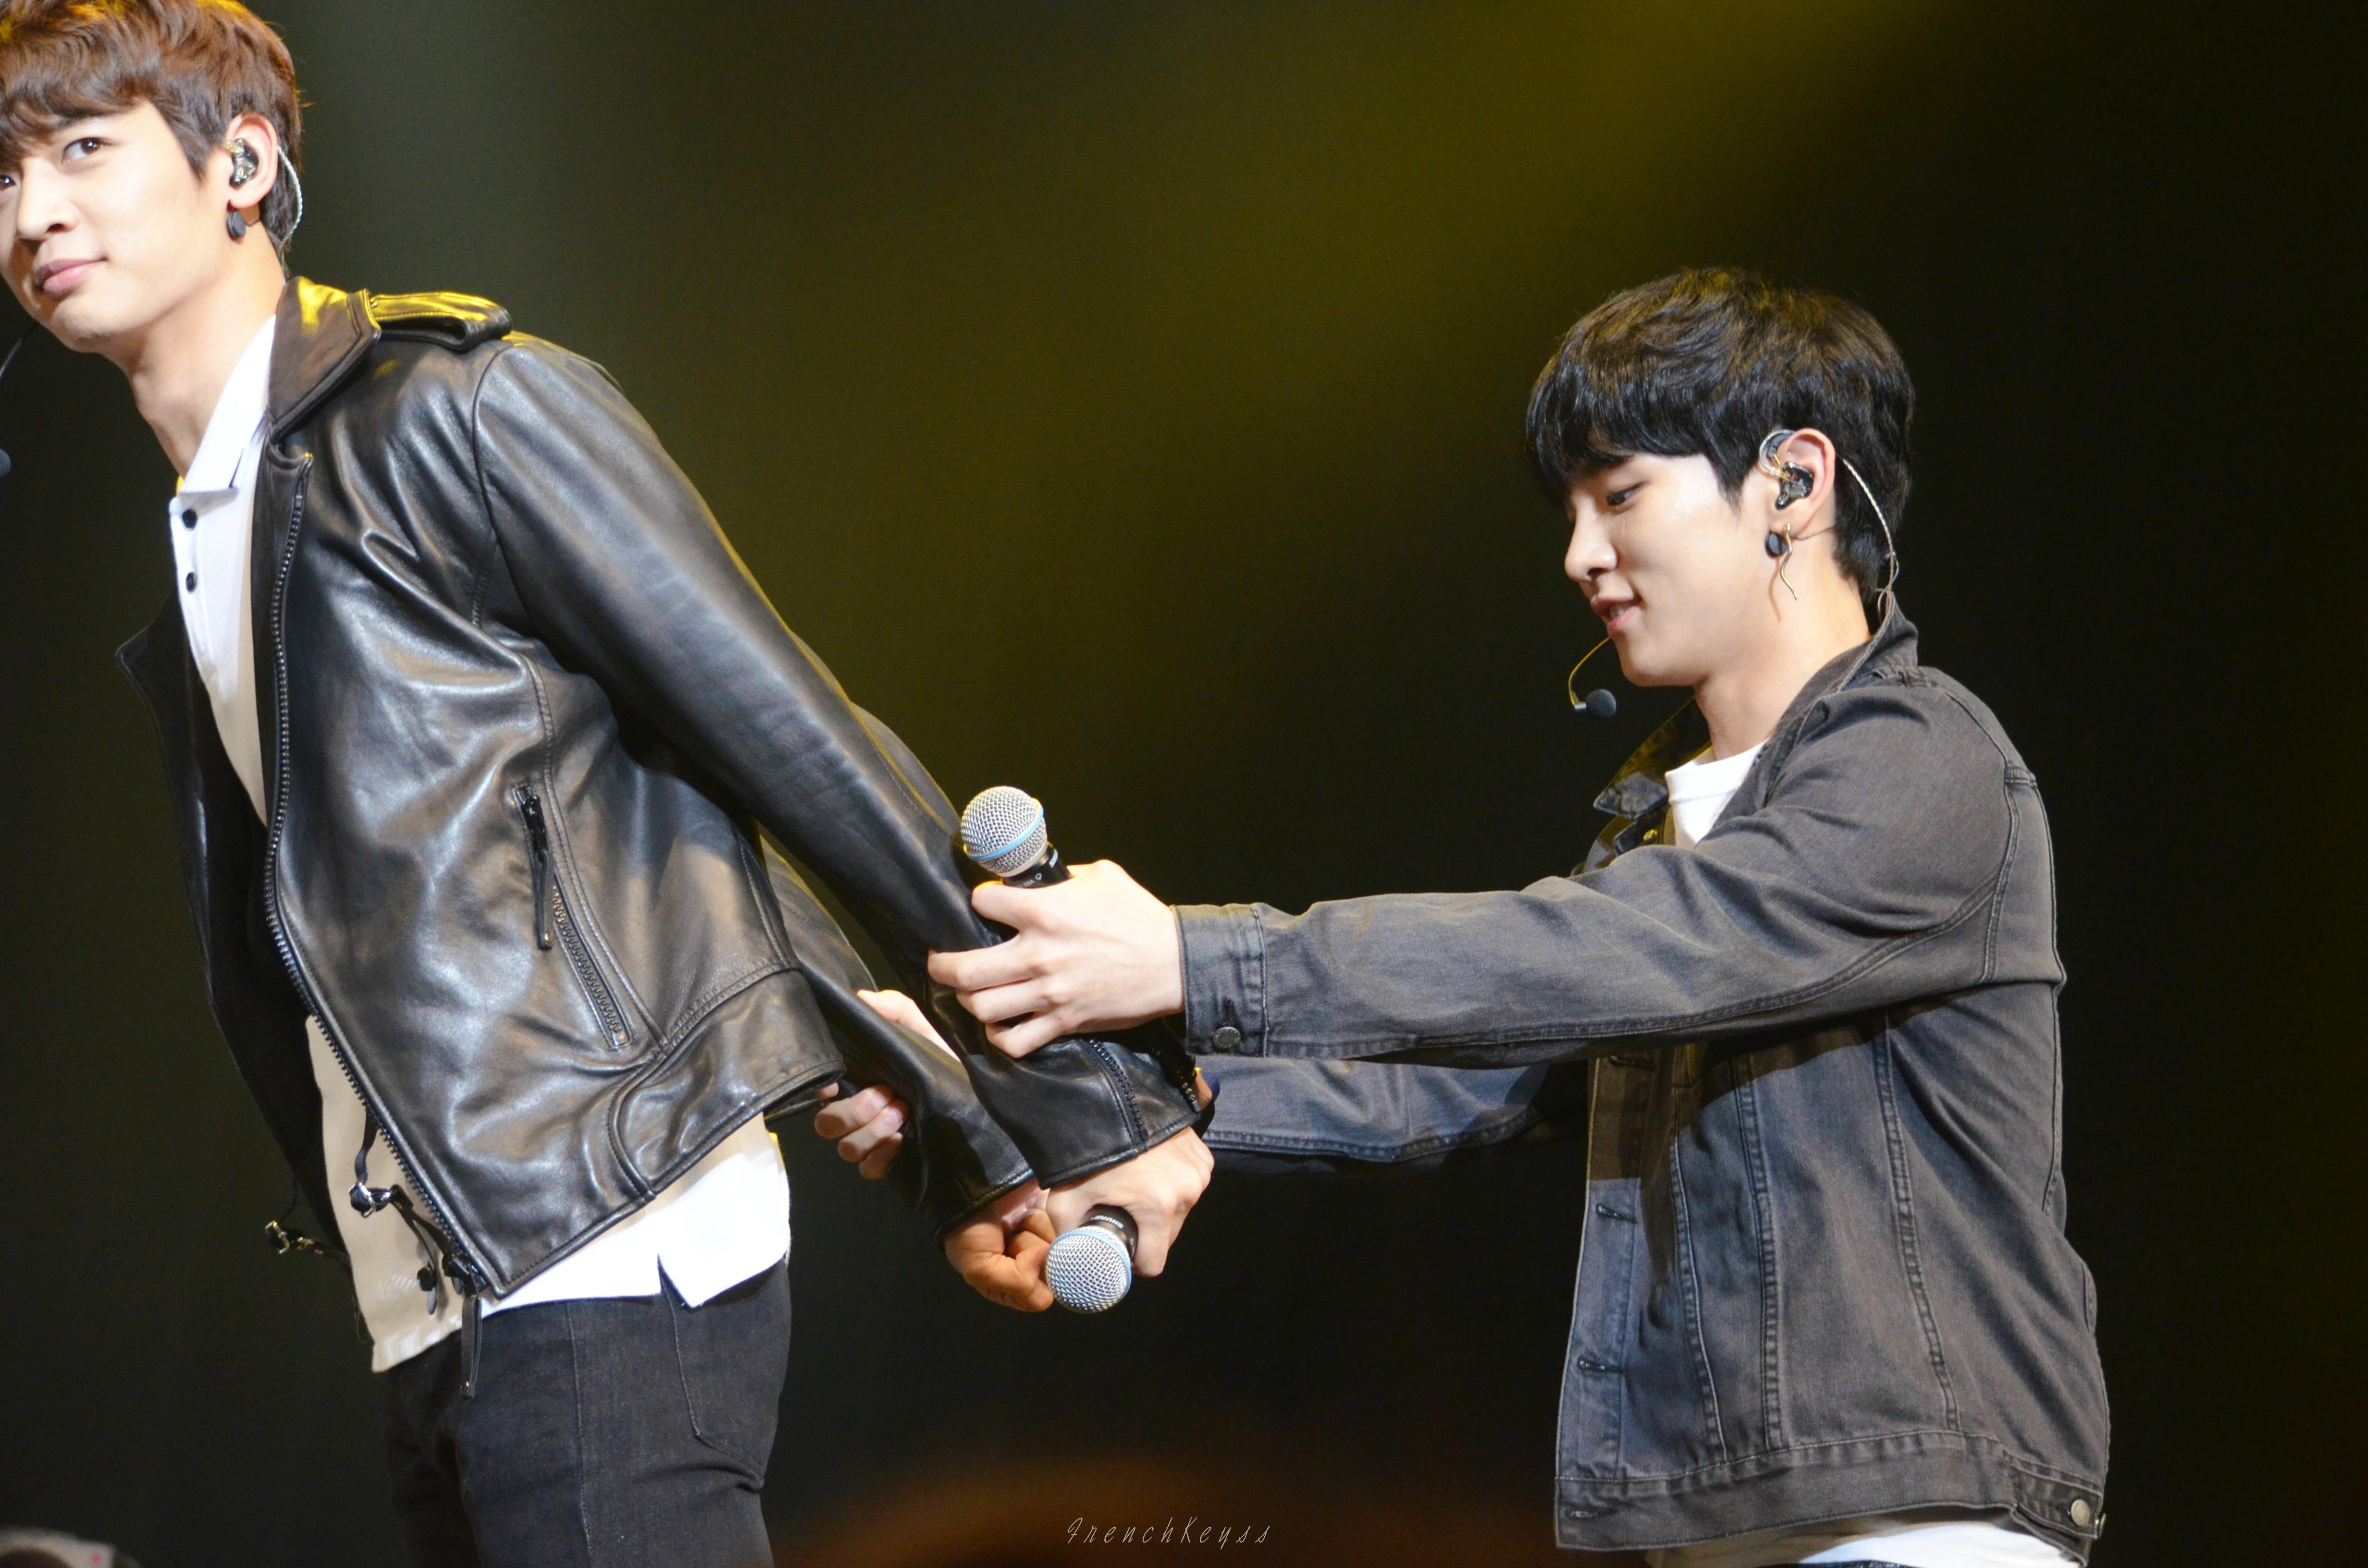 Shinee Jonghyun And Key Adorable Jonghyun, Key...